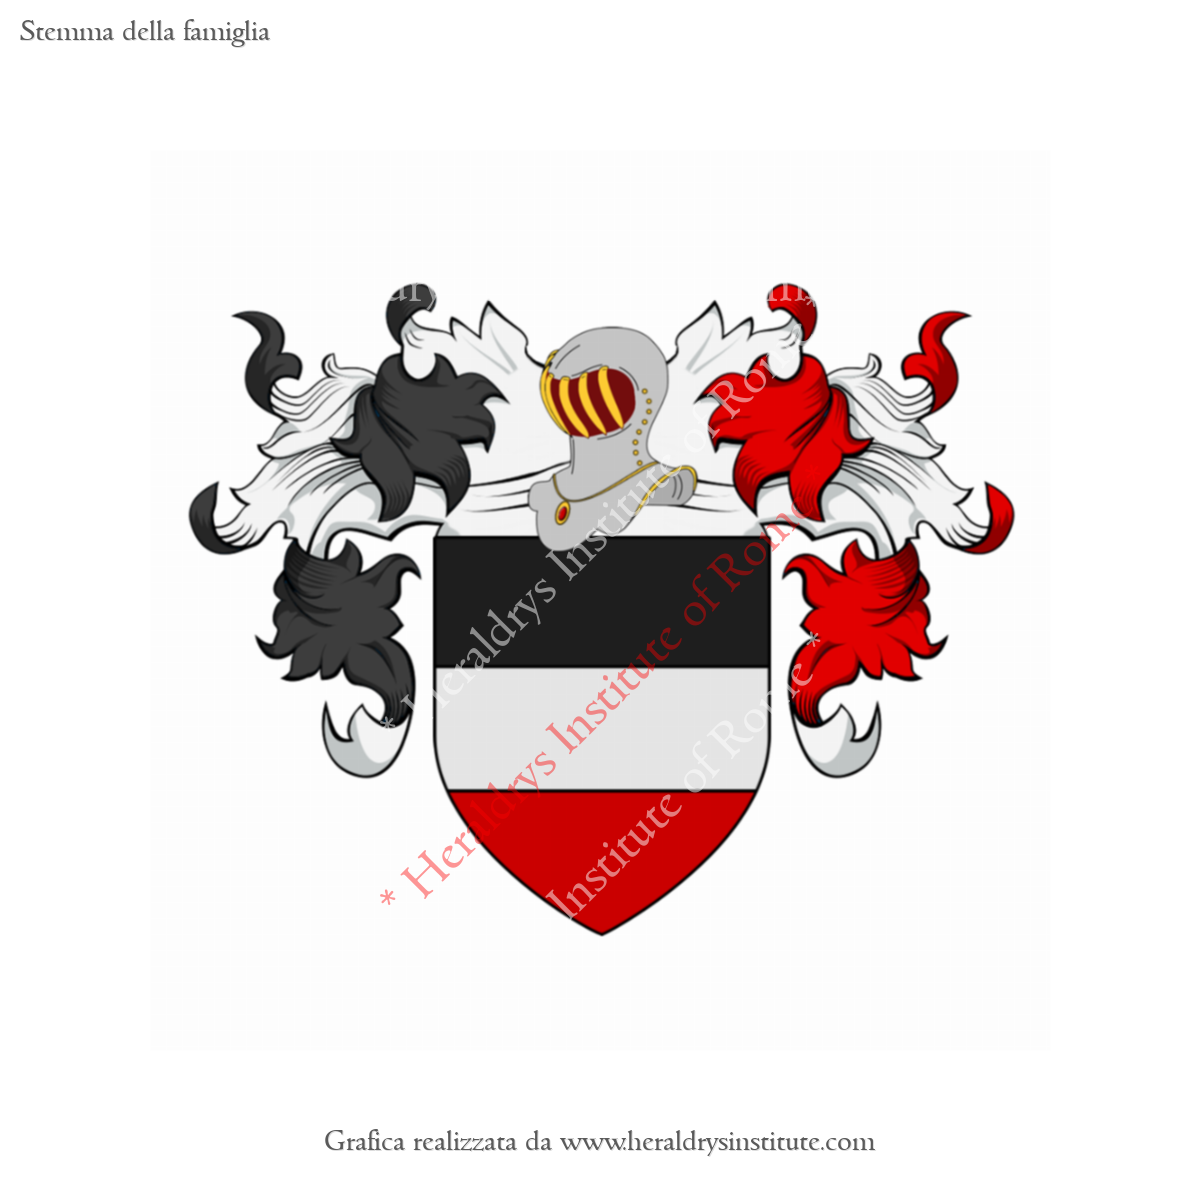 Fagagna escudo de armas origen apellido her ldica geneal for I nobili infissi opinioni